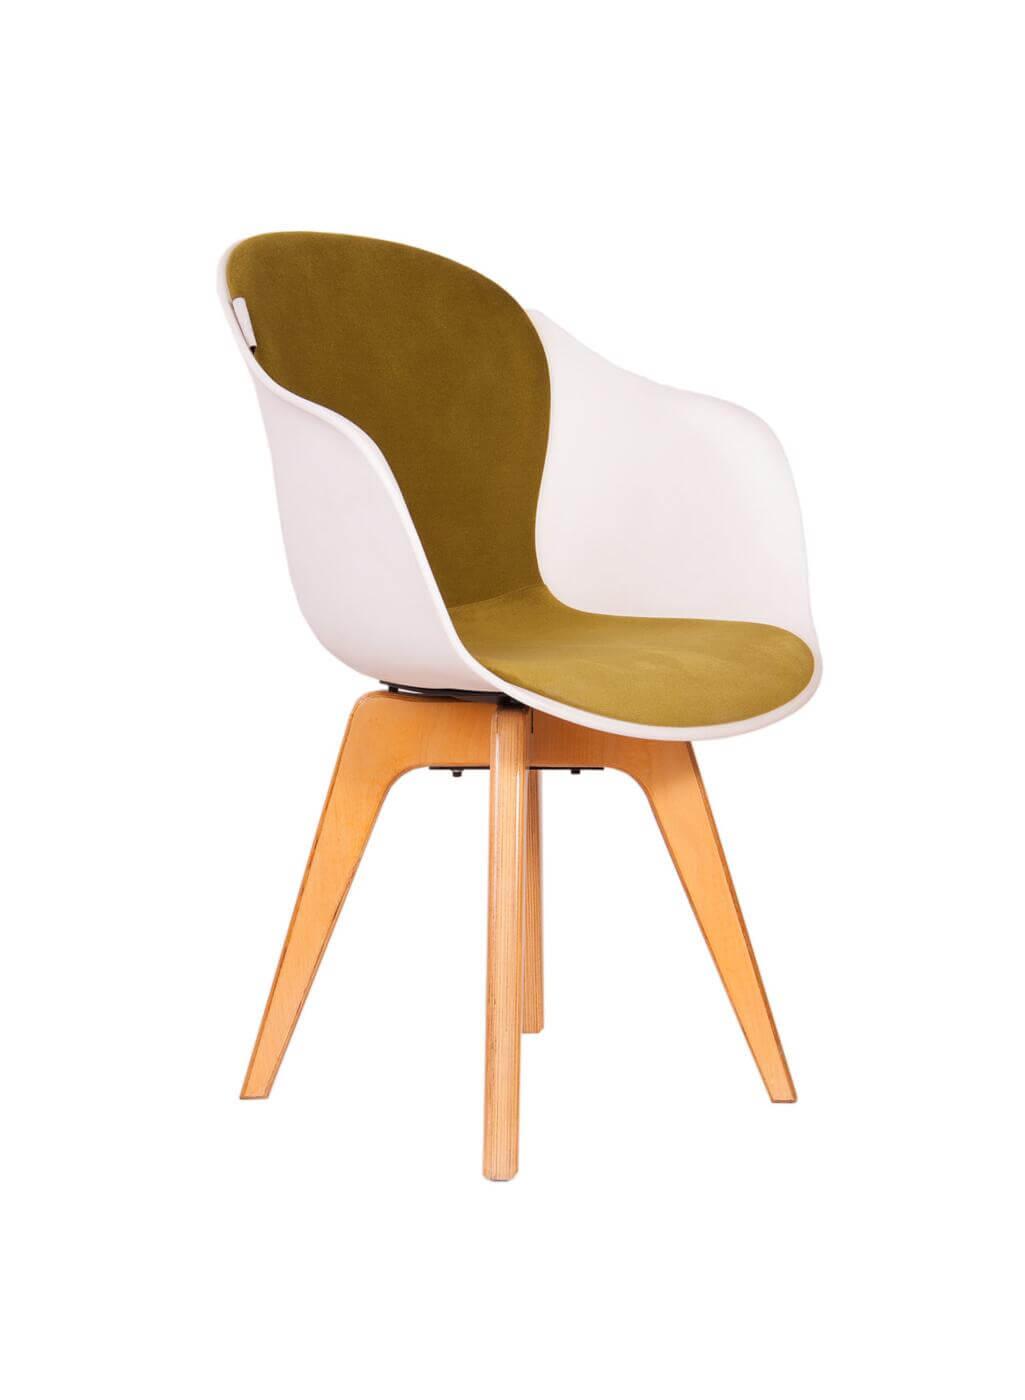 صندلی مدرن پایه چوبی کامفورت